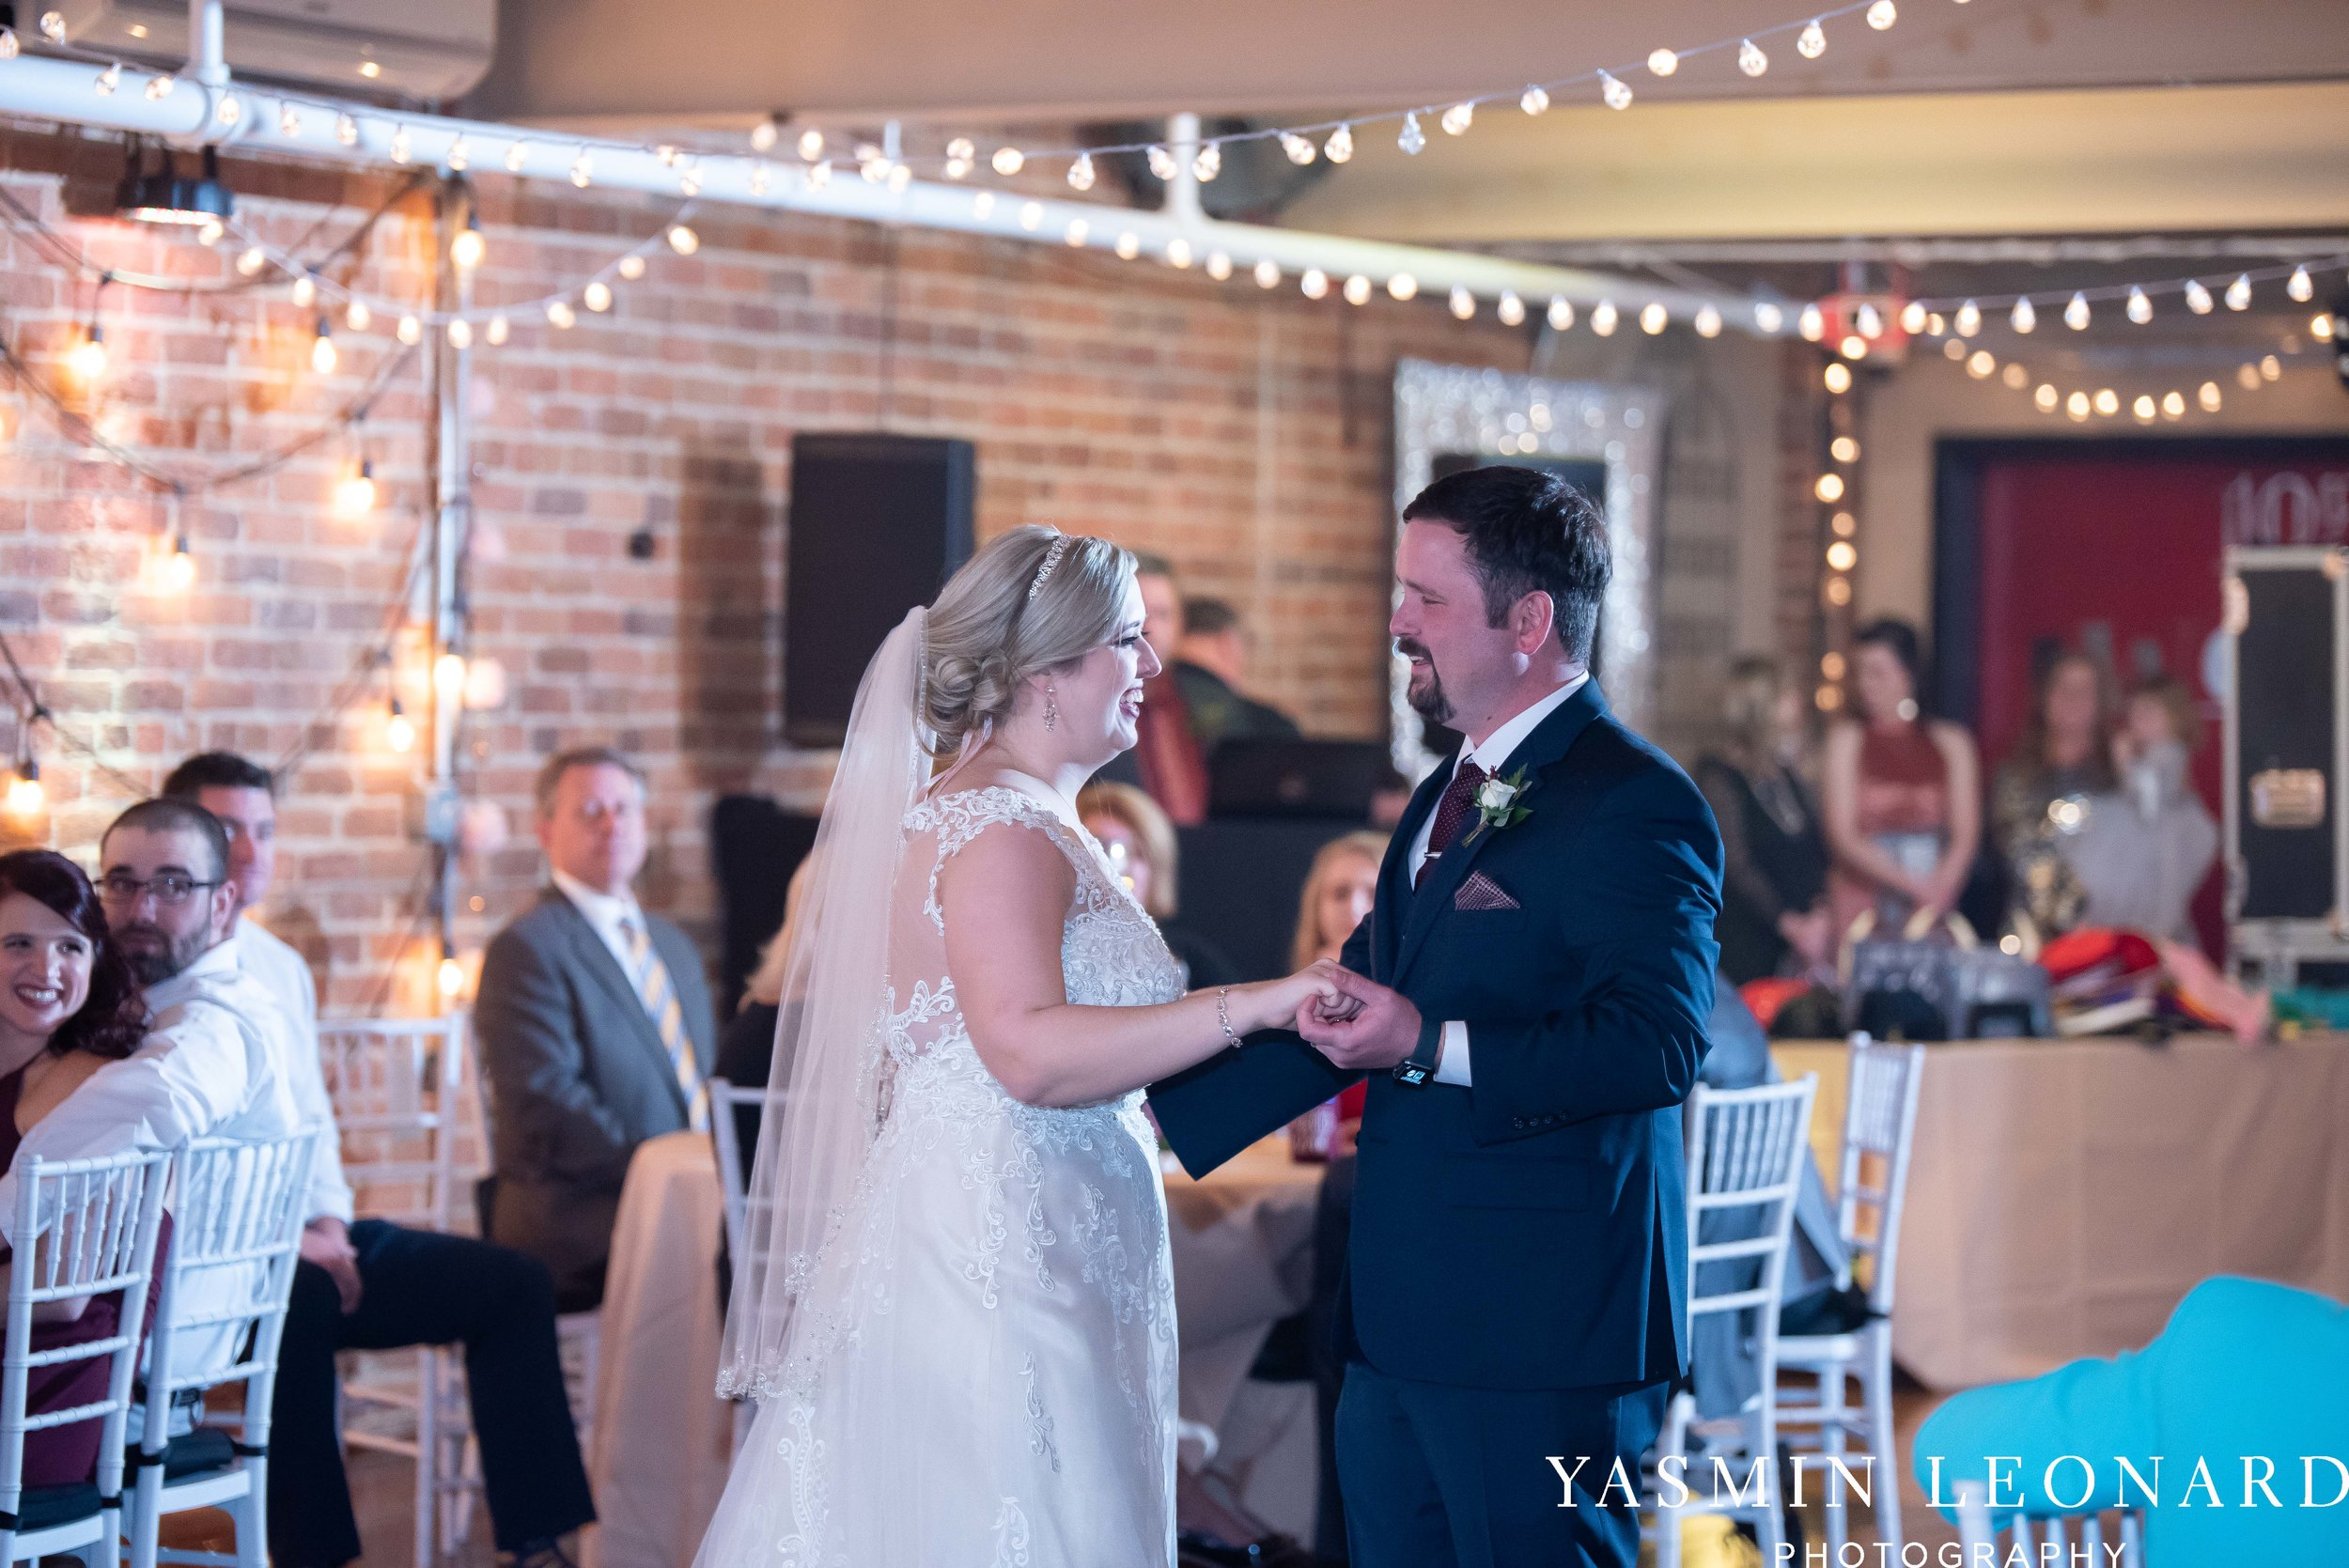 Rebekah and Matt - 105 Worth Event Centre - Yasmin Leonard Photography - Asheboro Wedding - NC Wedding - High Point Weddings - Triad Weddings - Winter Wedding-49.jpg